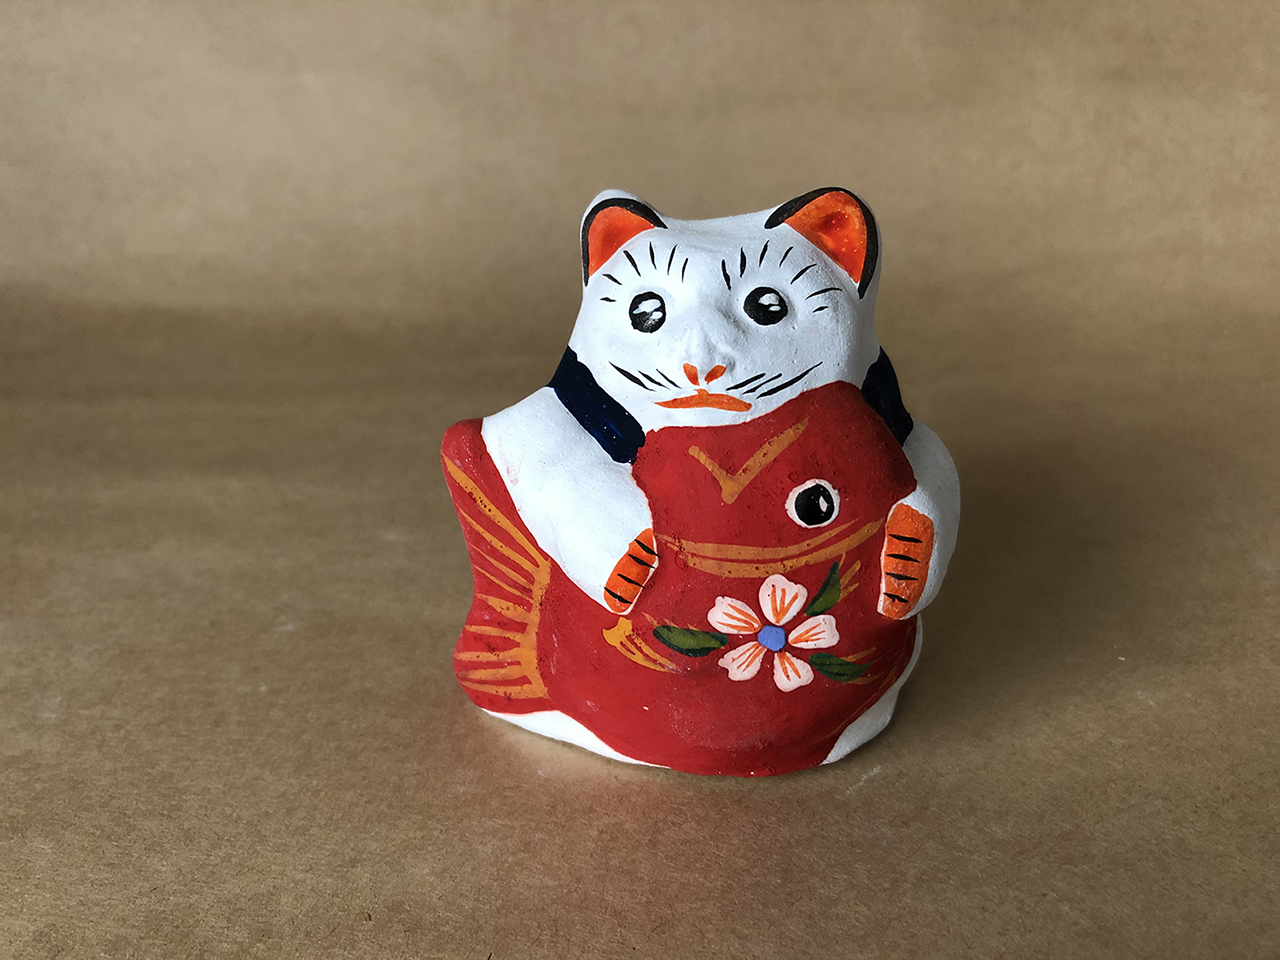 花巻人形工房|花巻人形「鯛抱き猫」